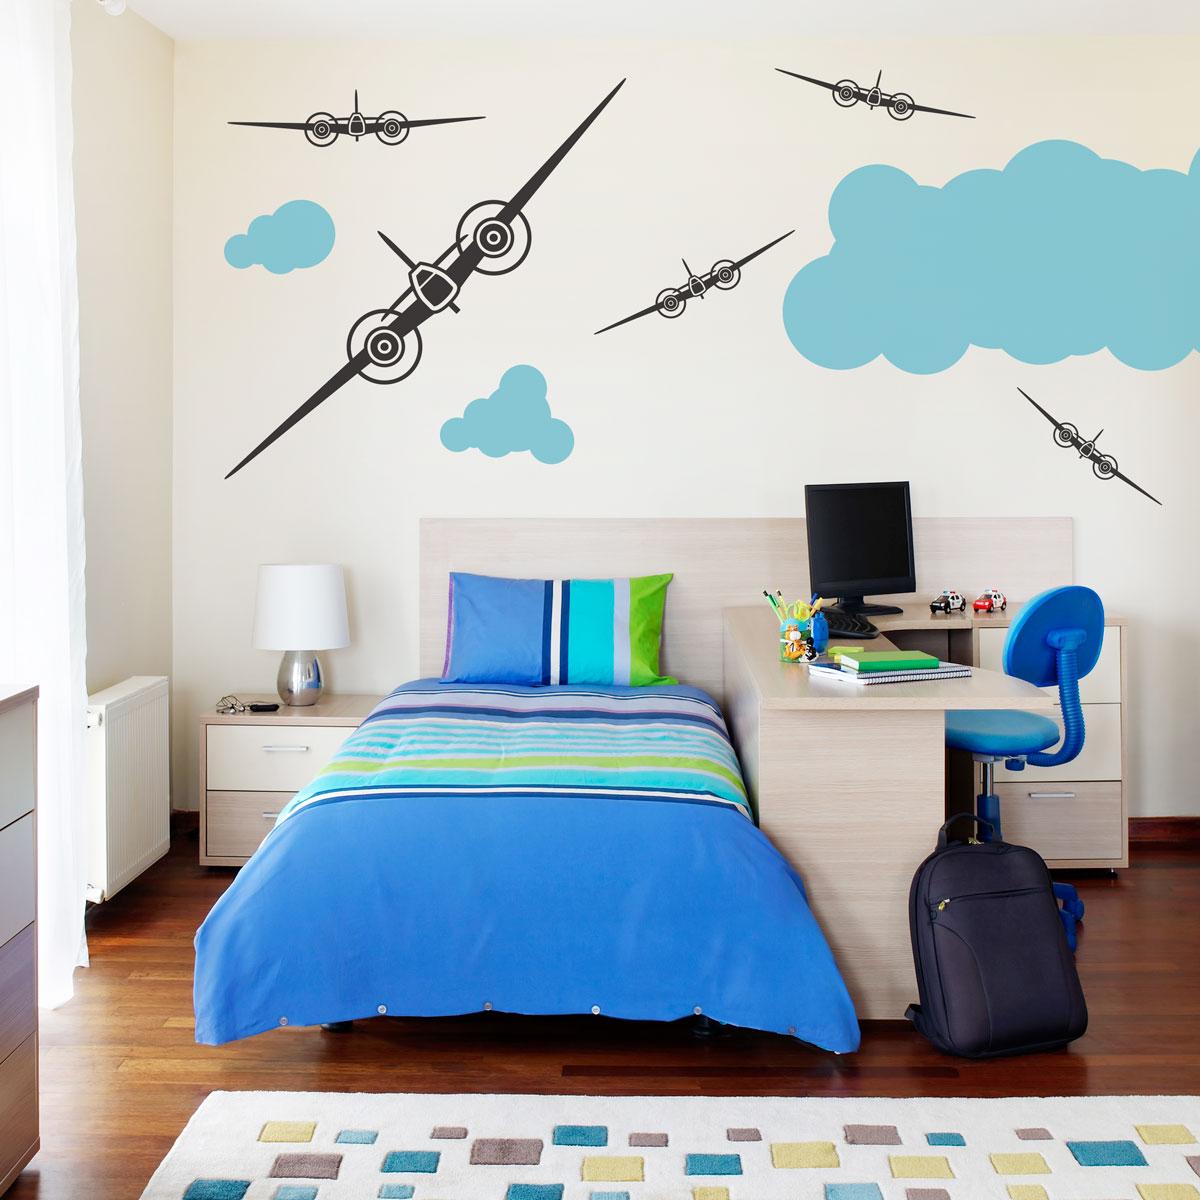 Military jets wall decal - Deco kamer volwassen blauw ...